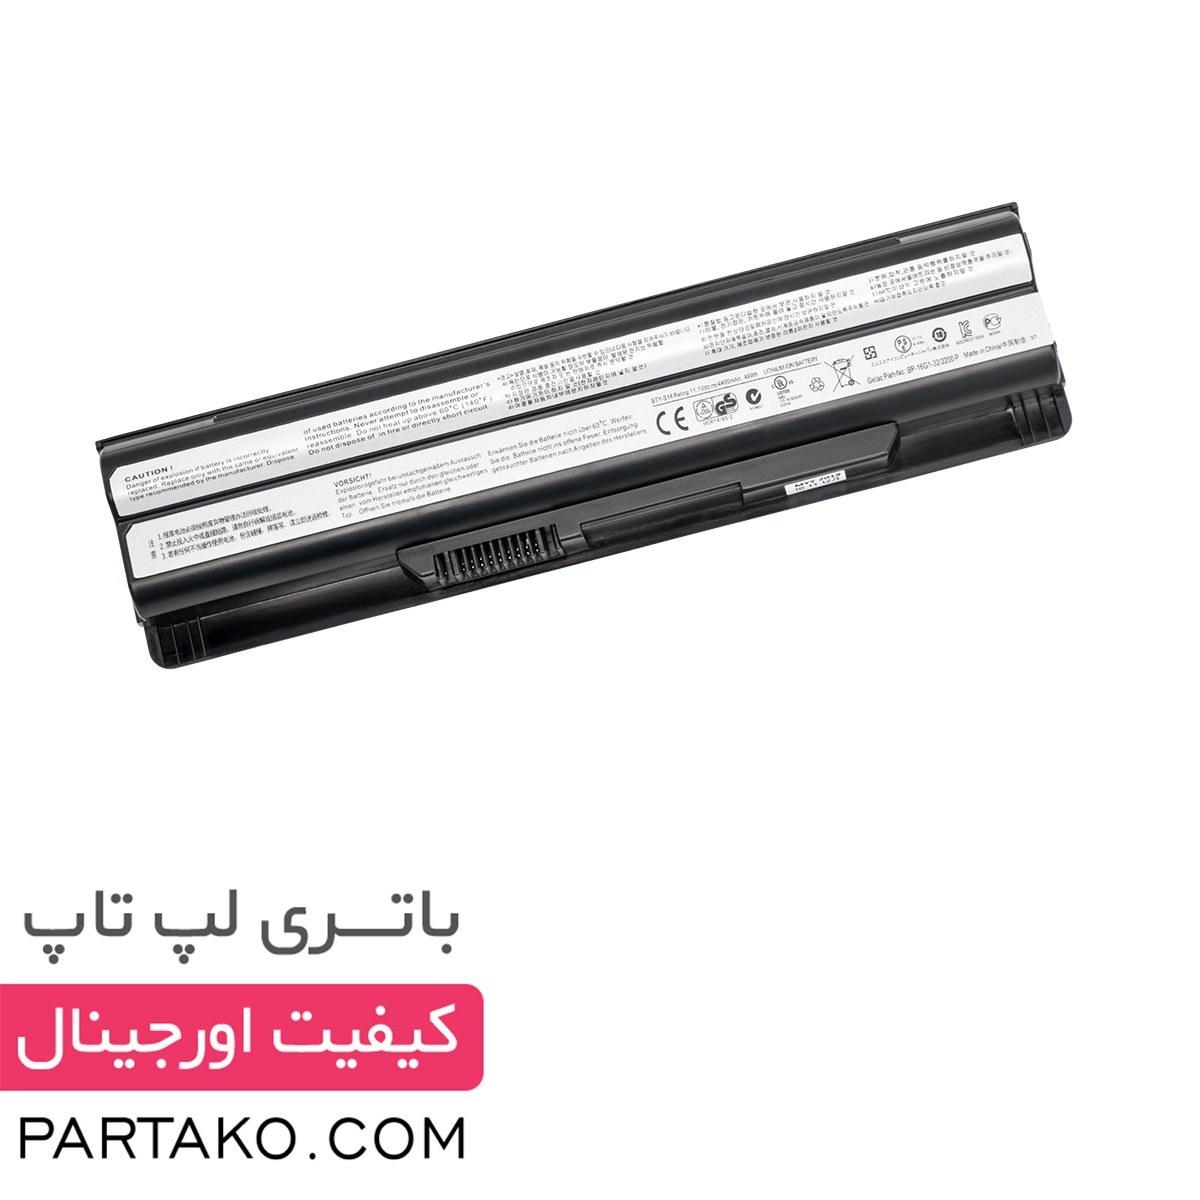 باتری لپ تاپ ام اس آی Laptop Battery MSI GE60 CX61 E1311